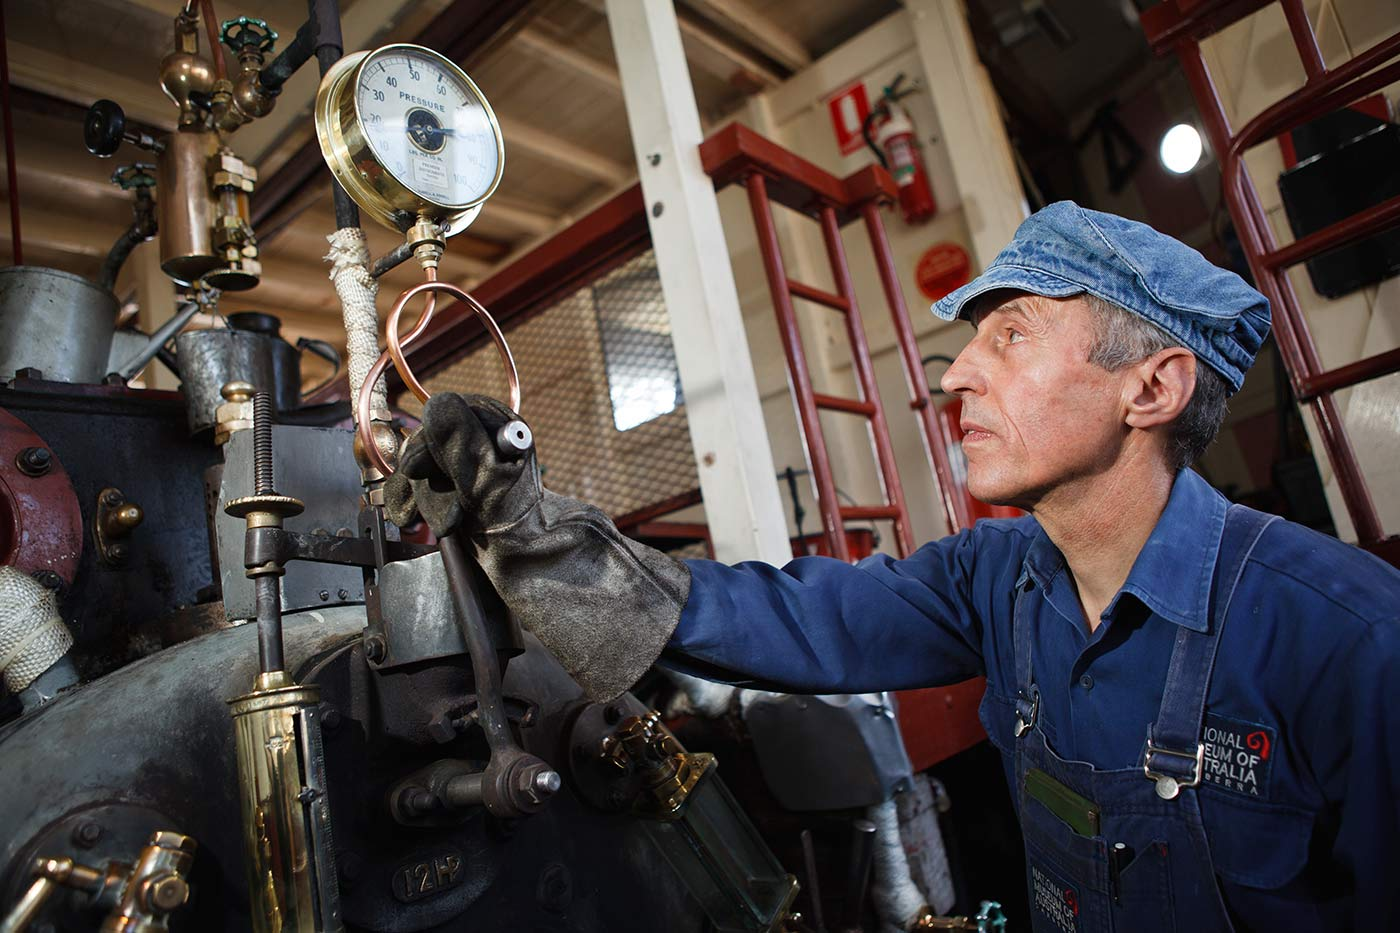 Engineer and volunteer Joe Johnson keeping the PS Enterprise steaming on Lake Burley Griffin.